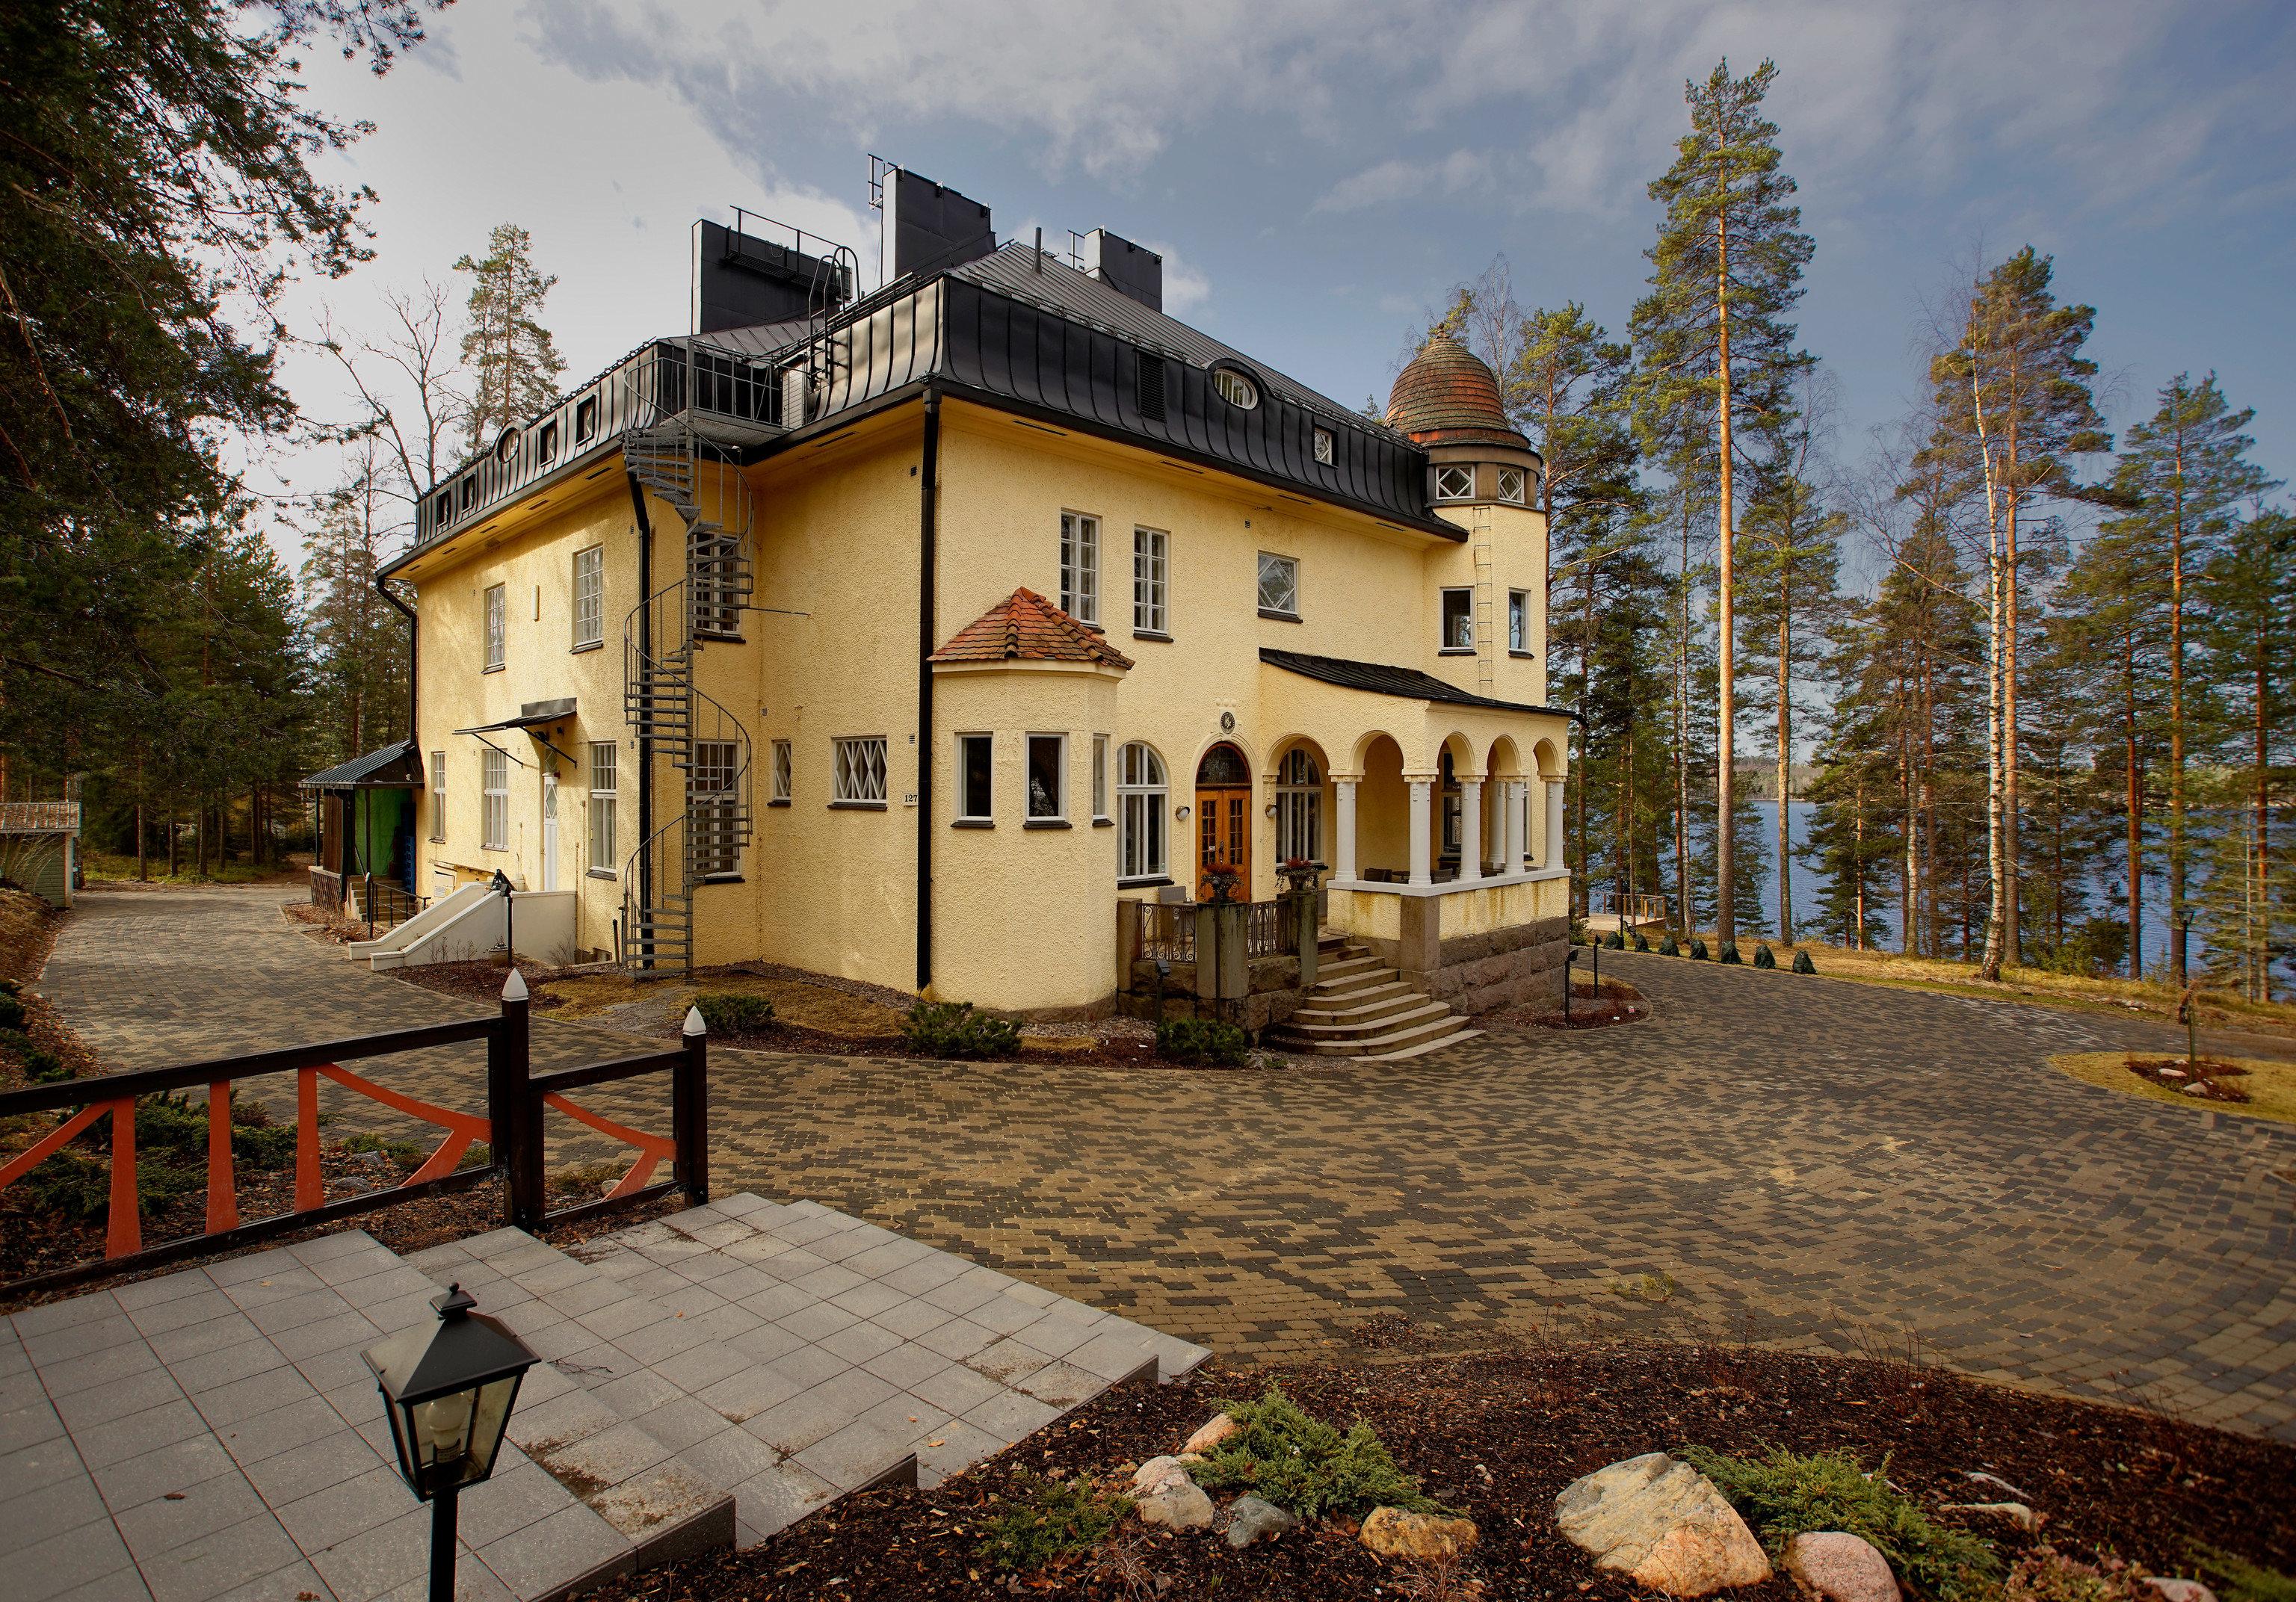 Denmark Finland Hotels Landmarks Luxury Travel Sweden outdoor tree ground property home estate house real estate cottage Villa building sky mansion facade window farmhouse stone walkway